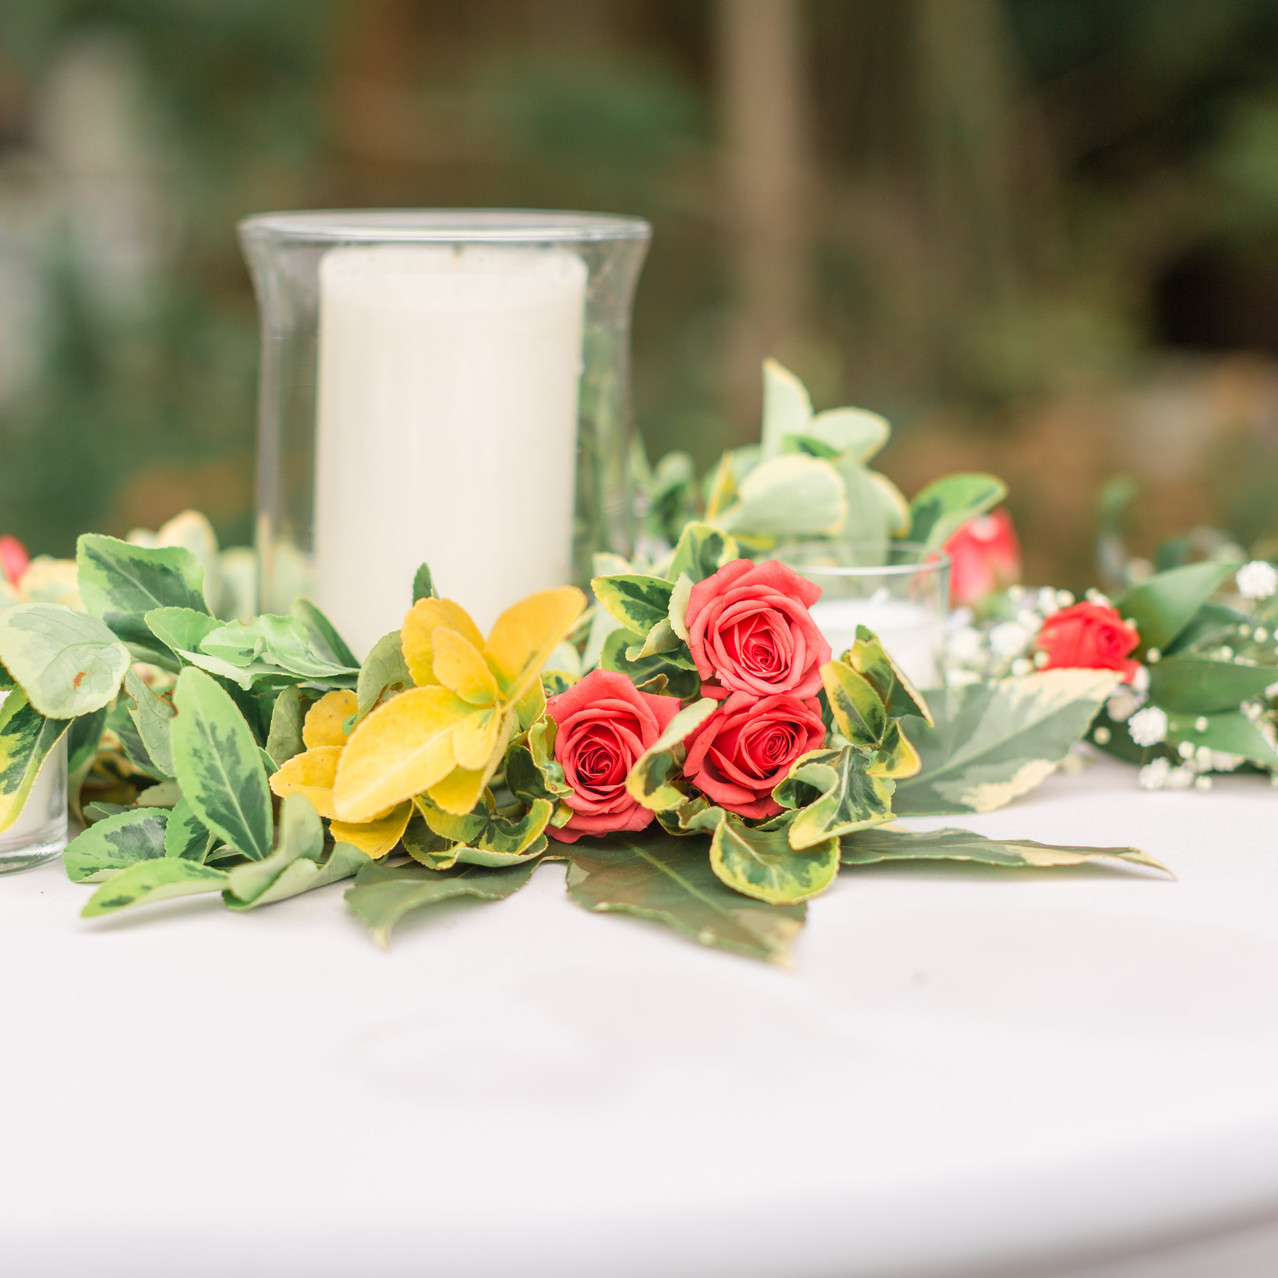 bartop floral arrangement